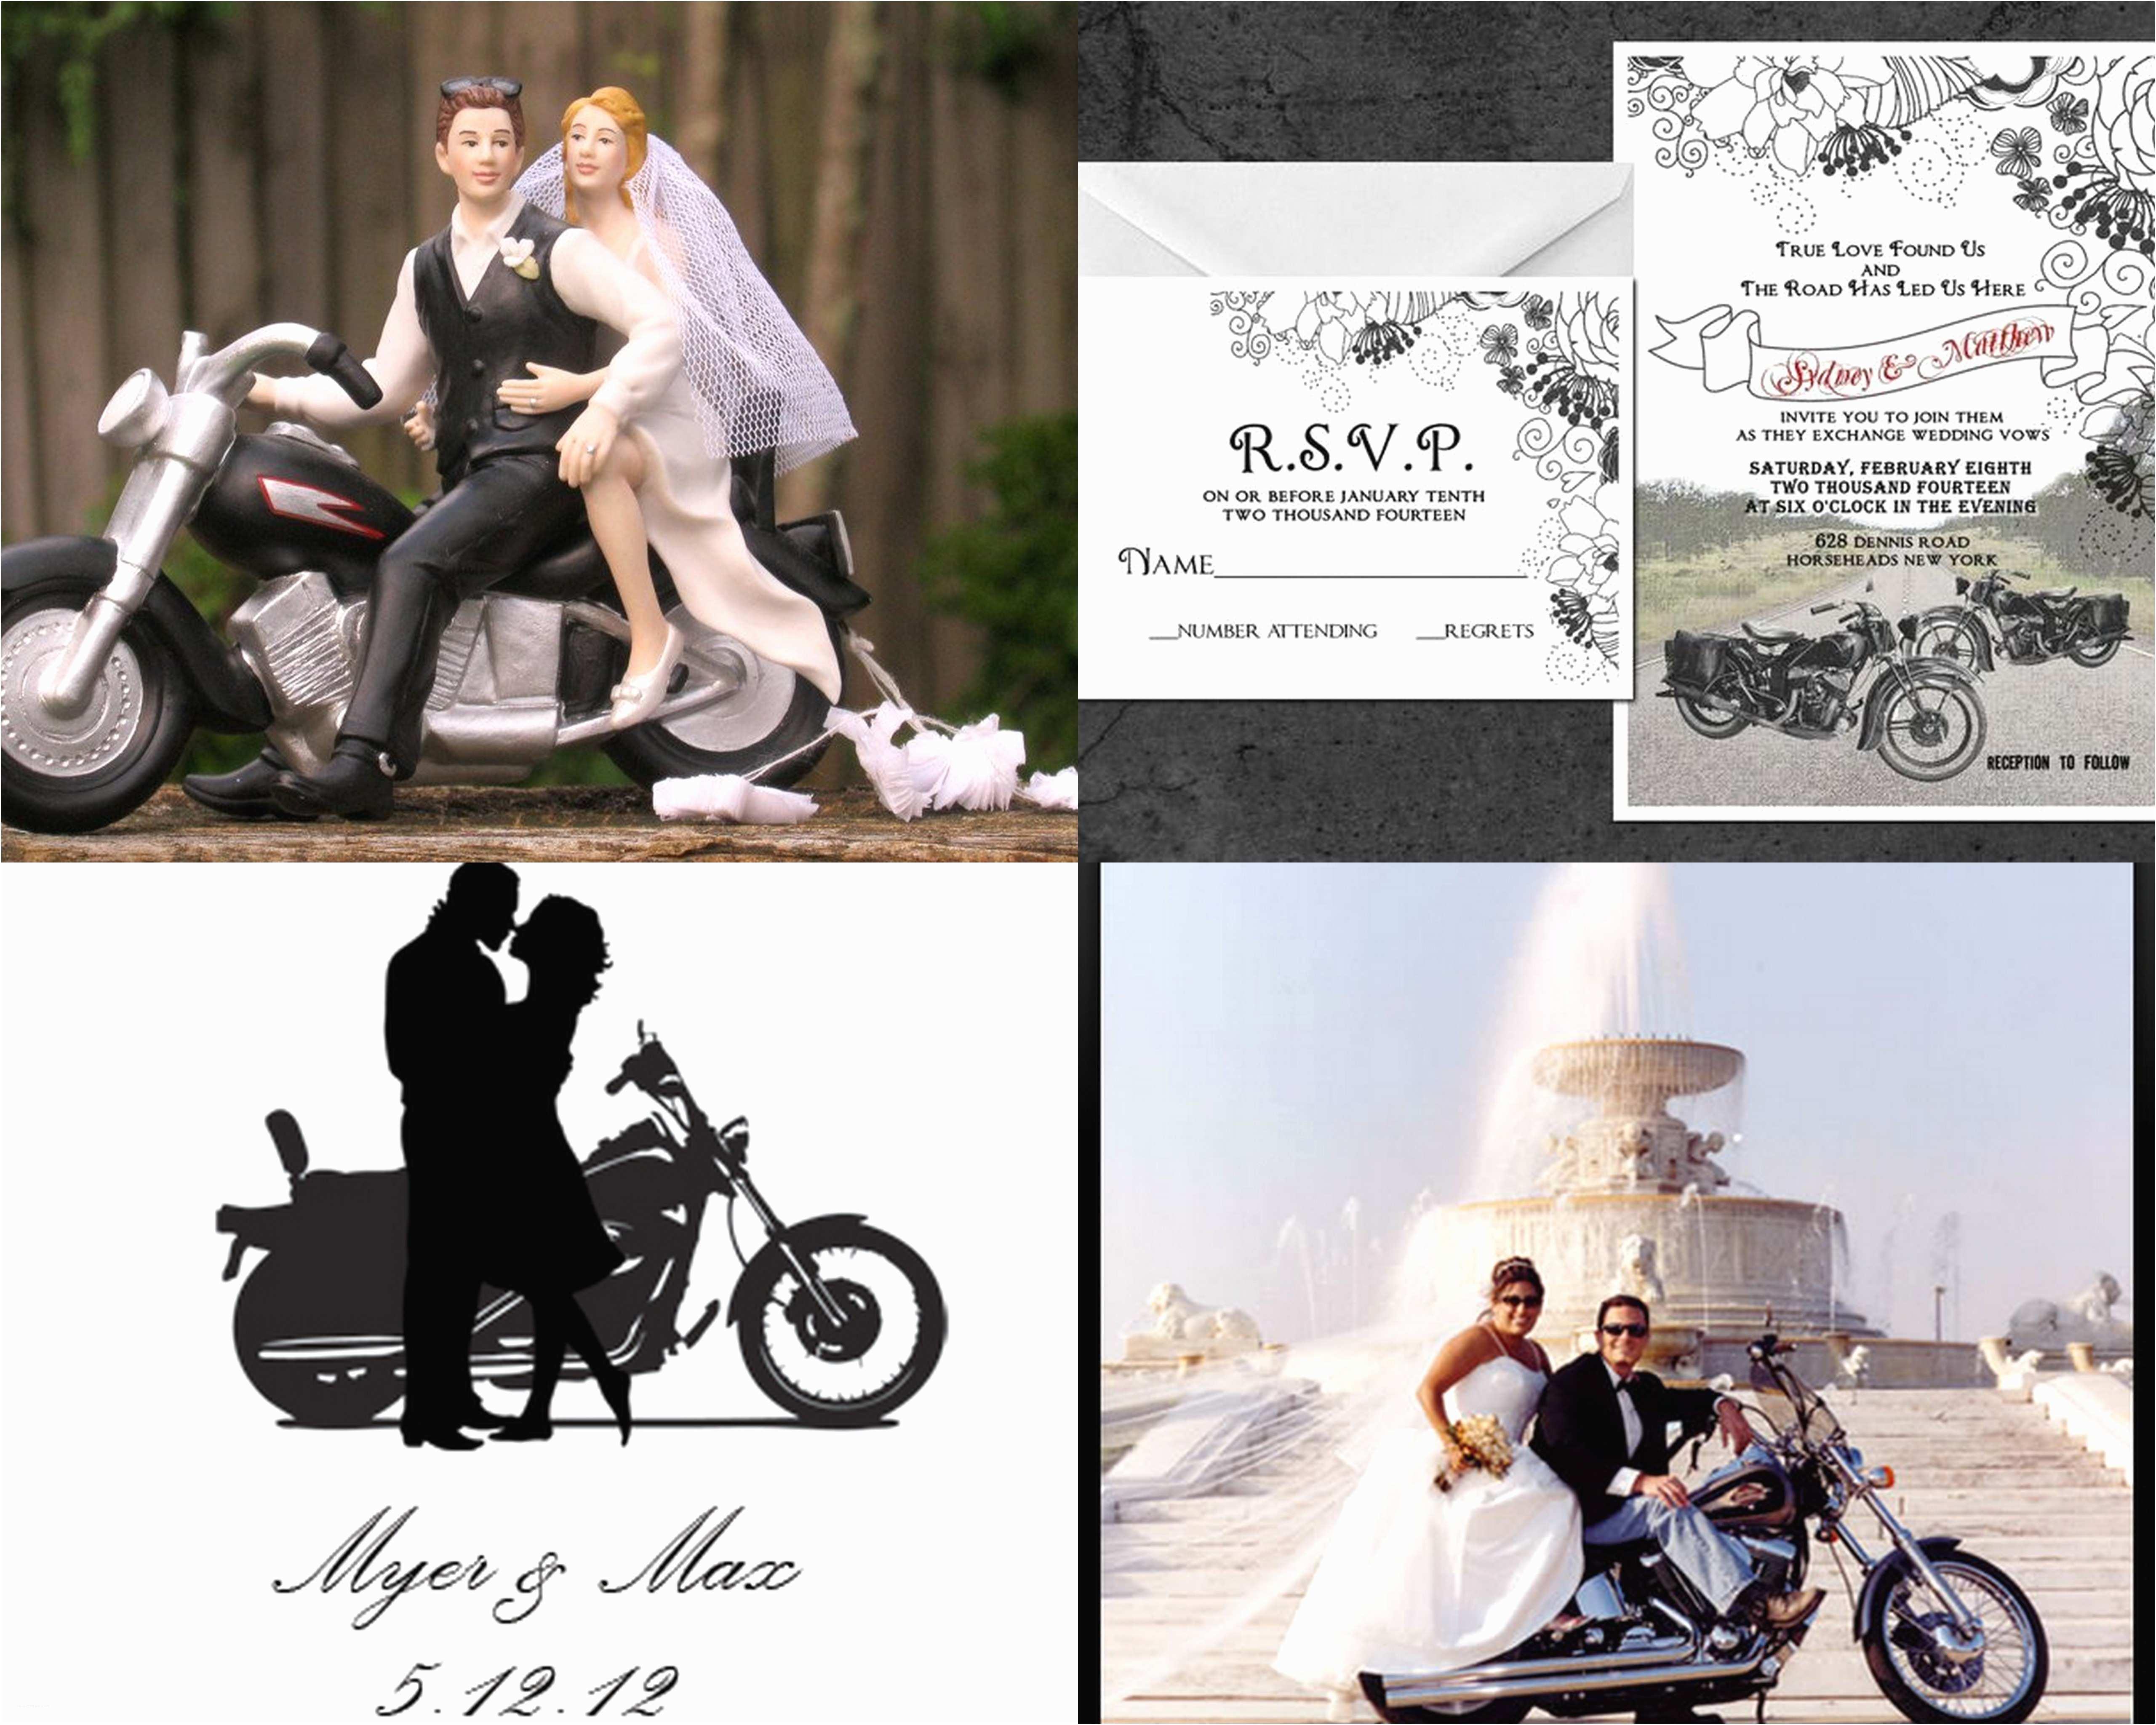 Wedding Invitations Under $1 Motorcycle Based Wedding Invitation